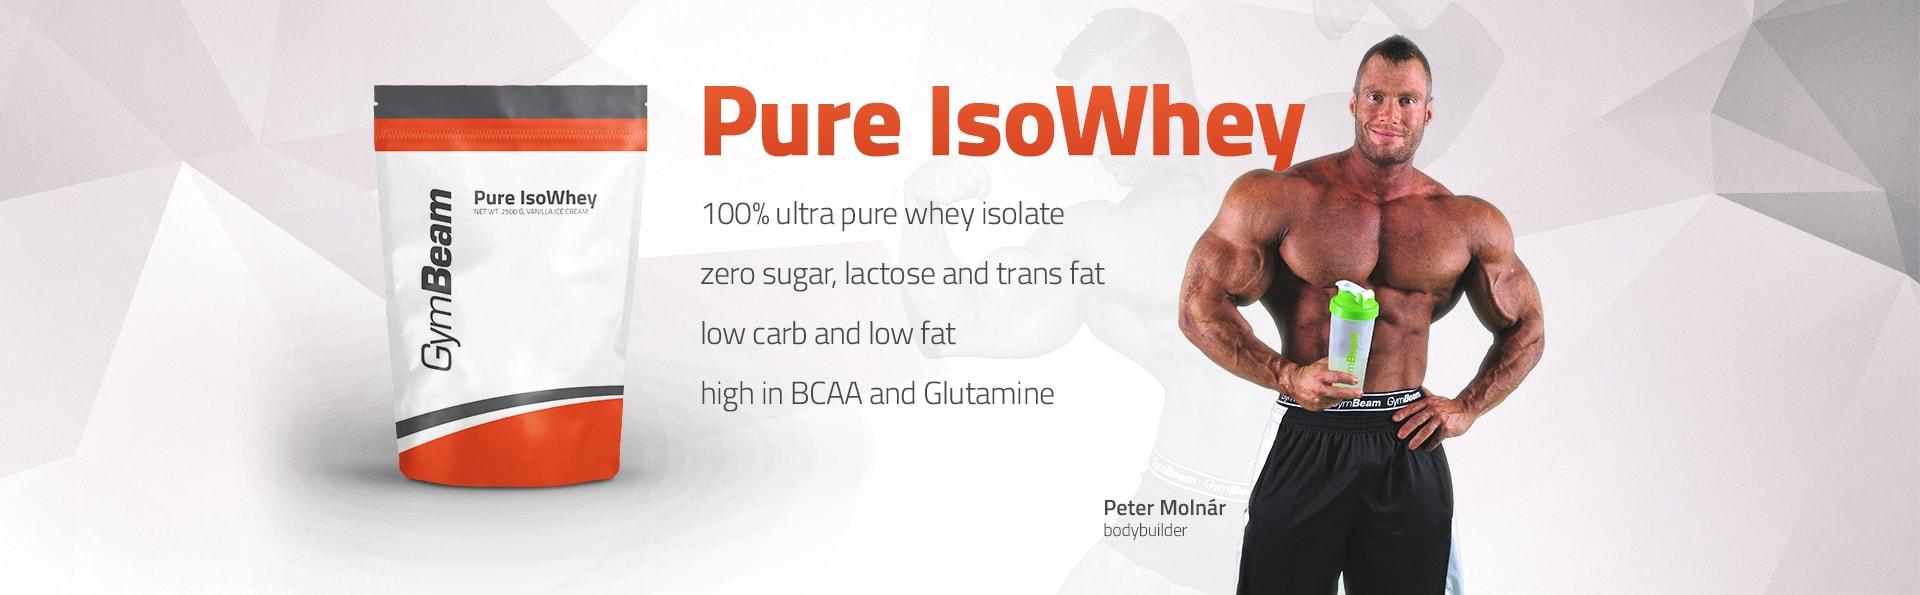 Gymbeam pure isowhey proteinas